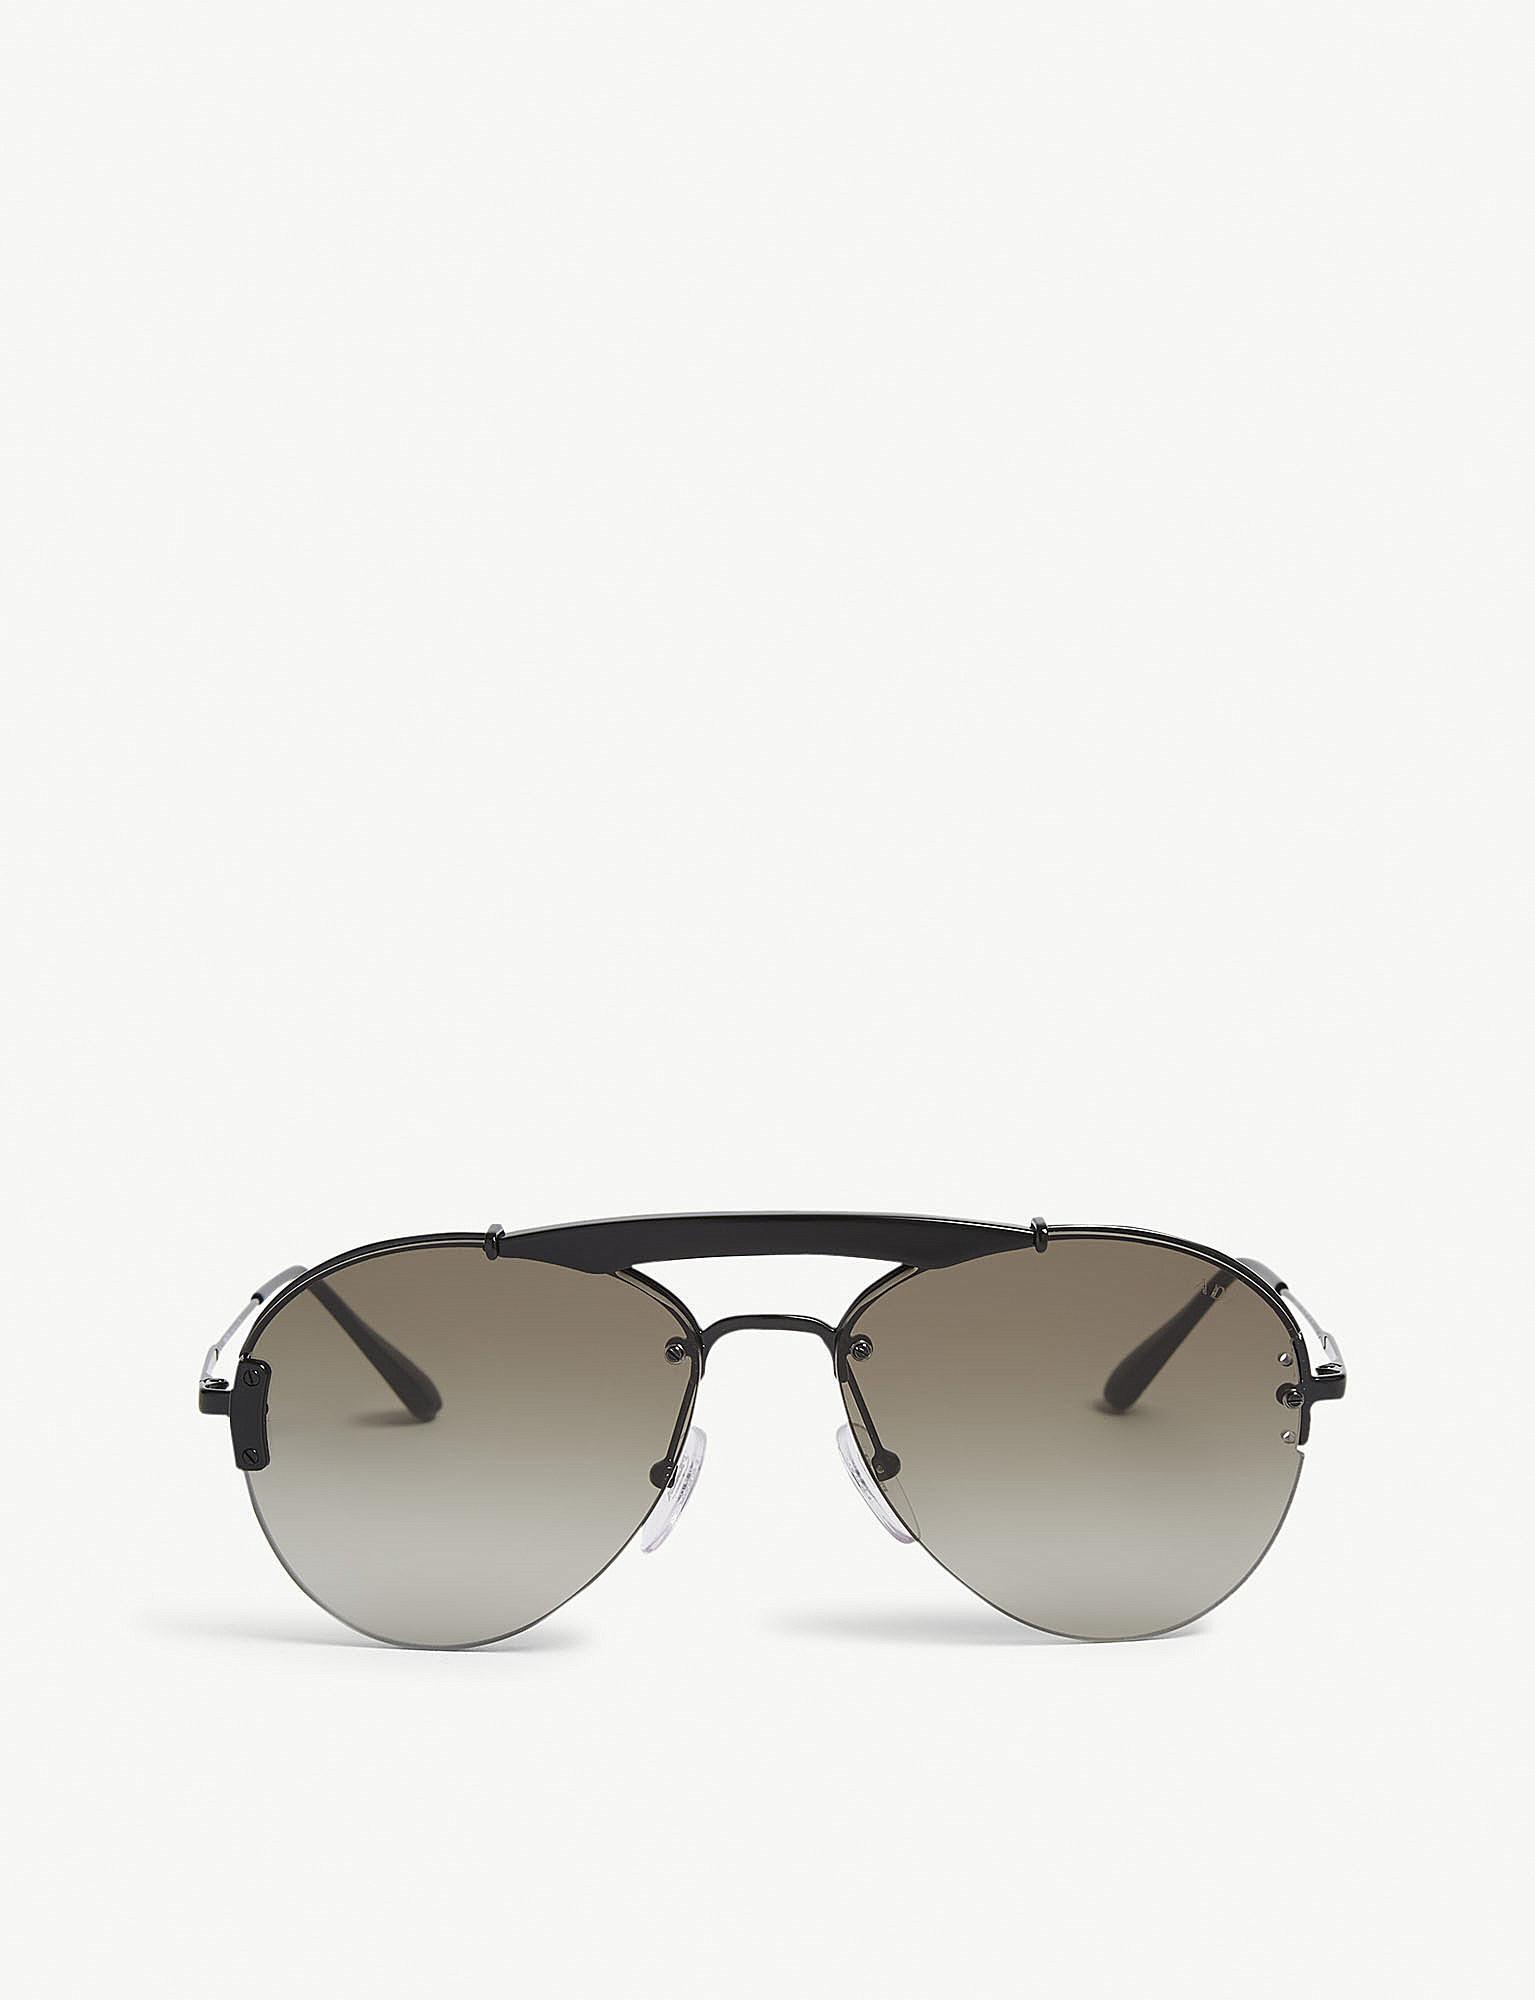 0a9eefad3279 ... ebay lyst prada pr62us pilot sunglasses in black for men 5cb2d a6a15 ...